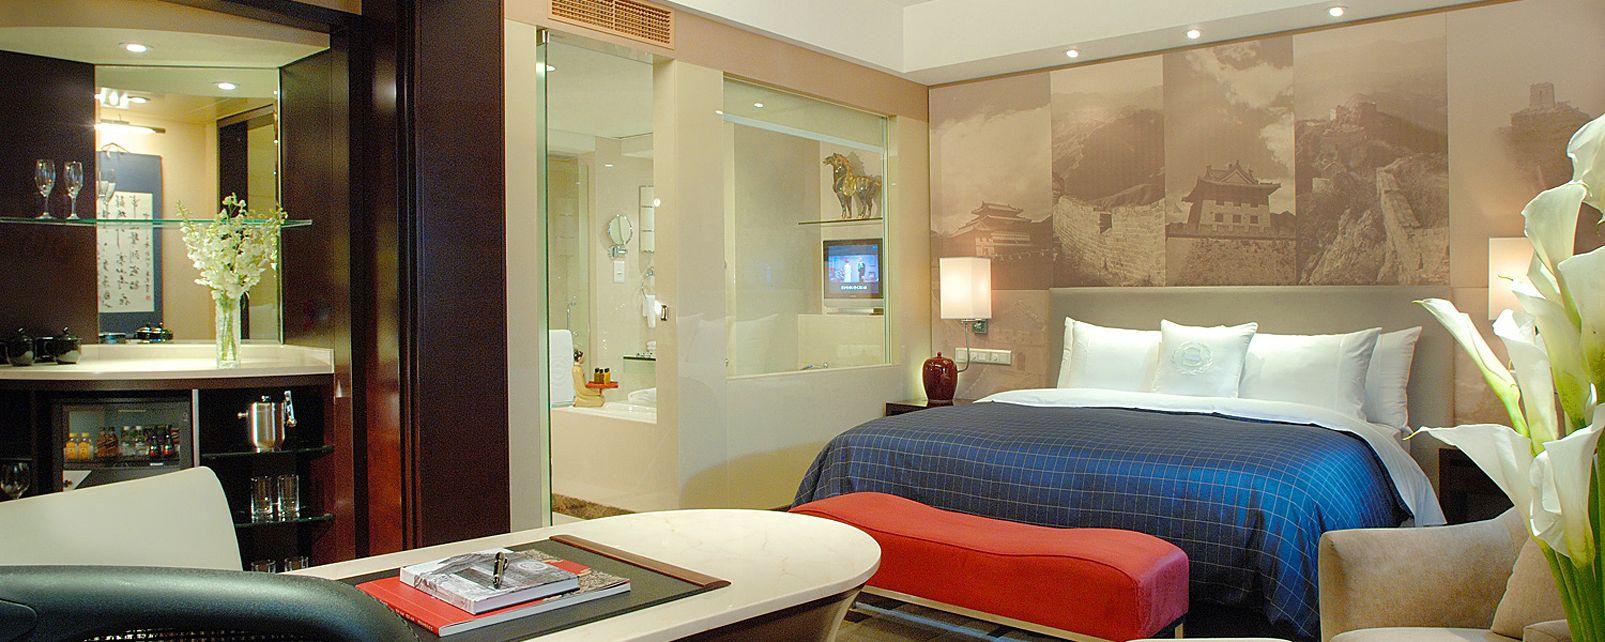 Hôtel The Great Wall Sheraton Hotel